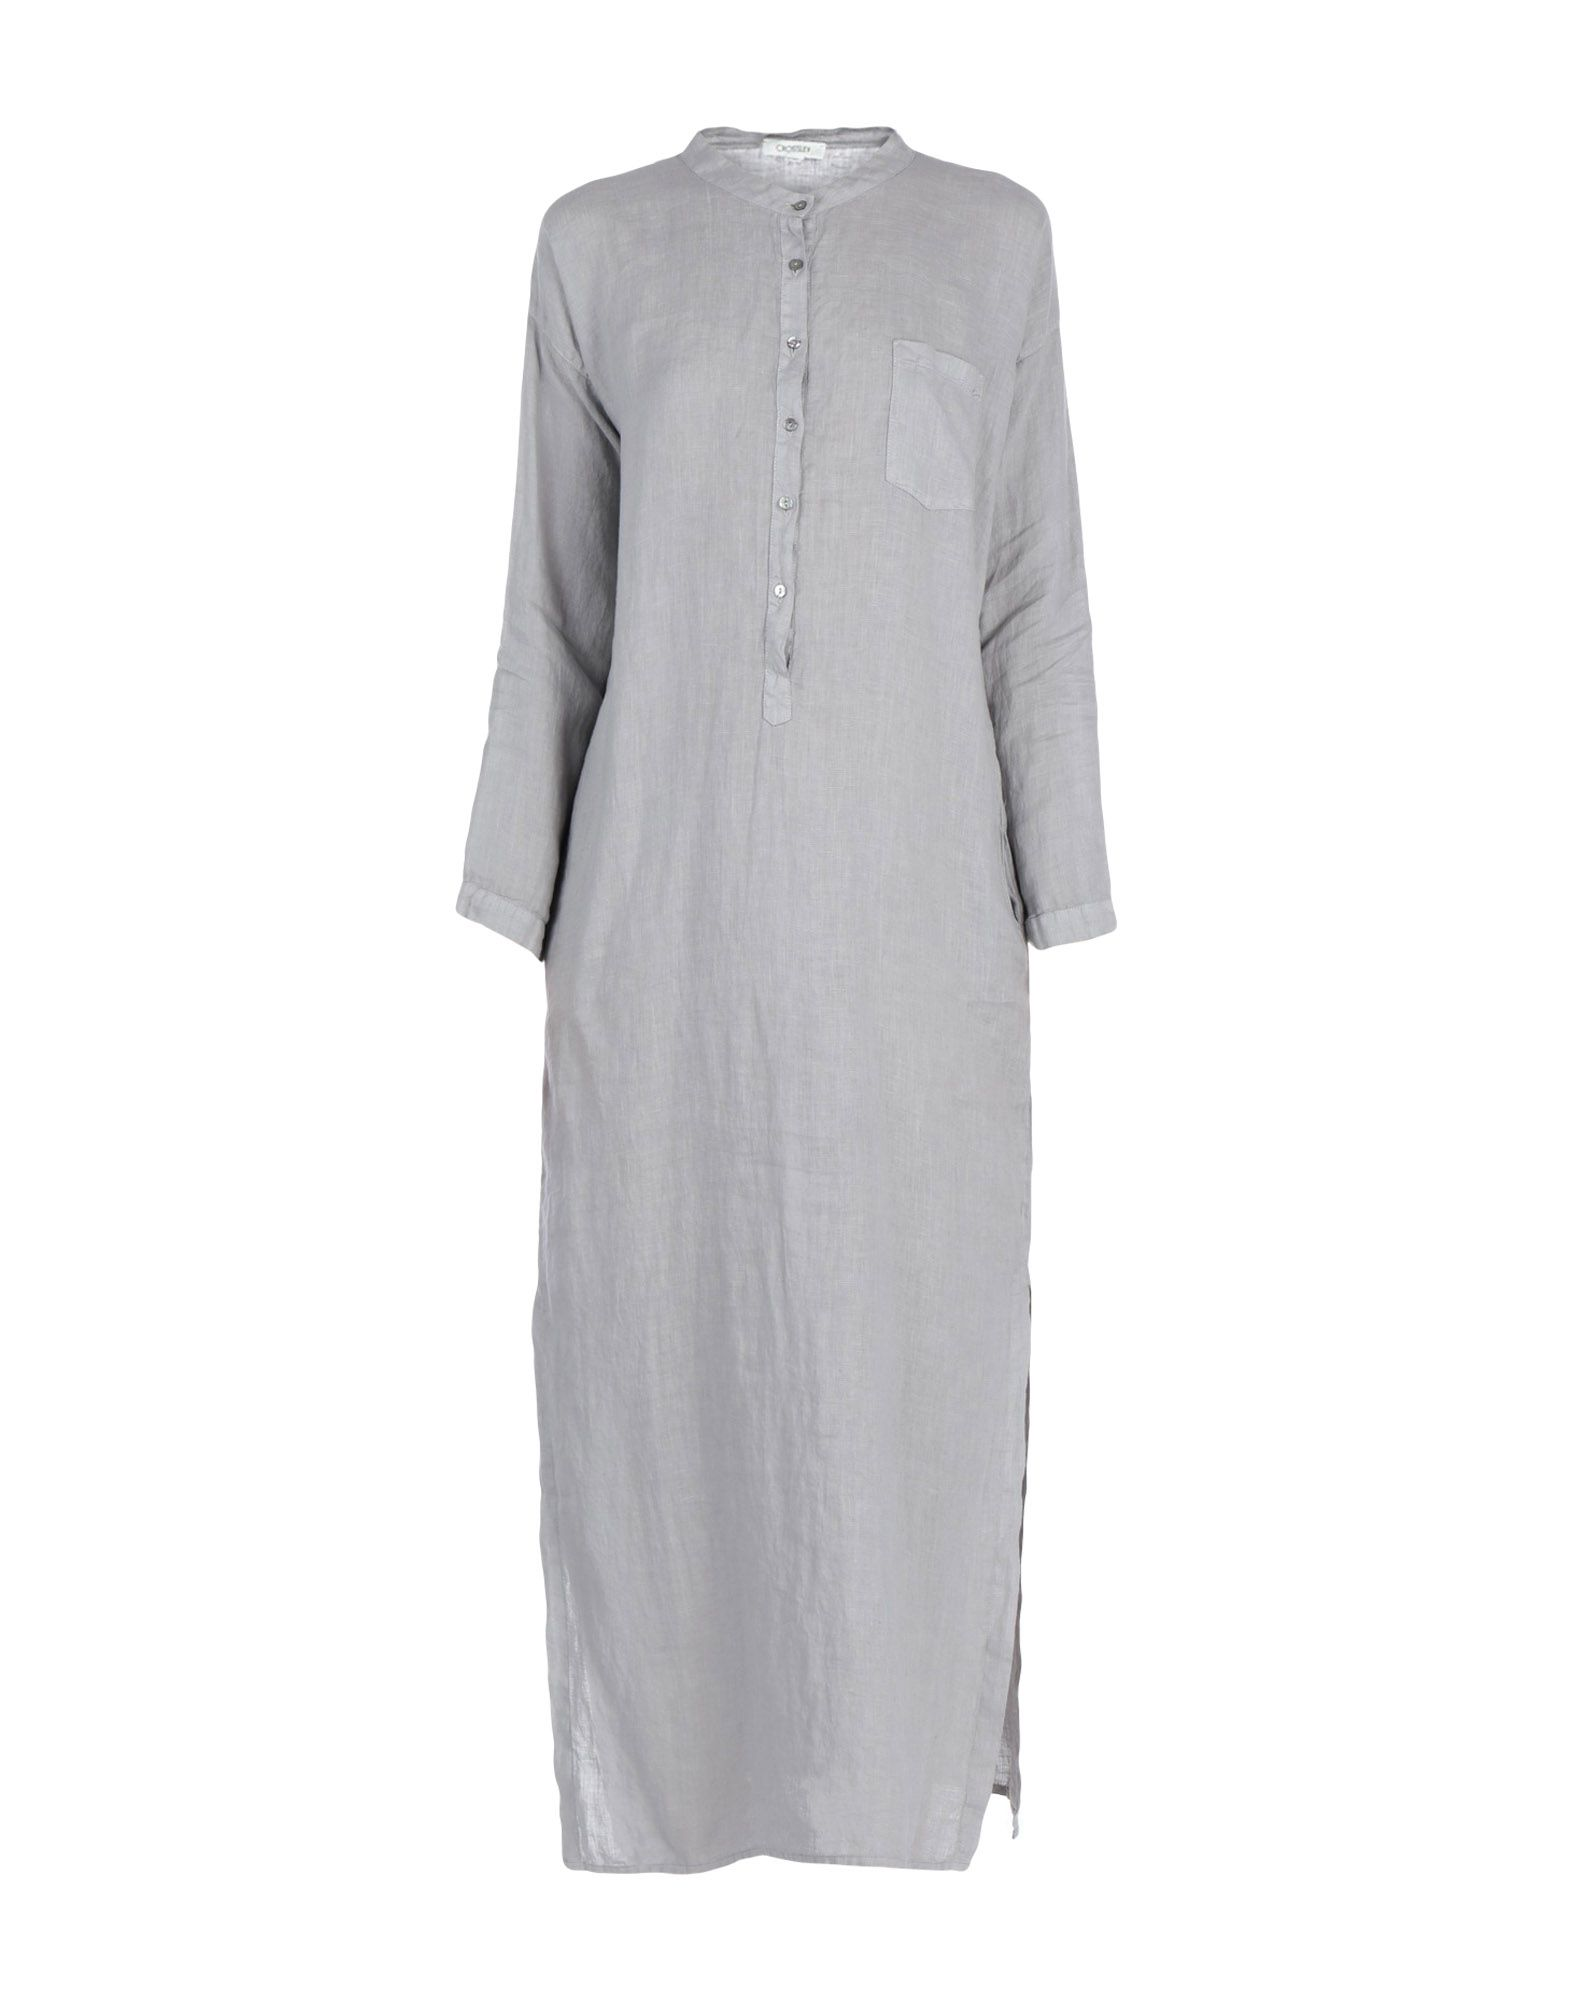 CROSSLEY Длинное платье платье рубашка fox yulia sway платье рубашка fox